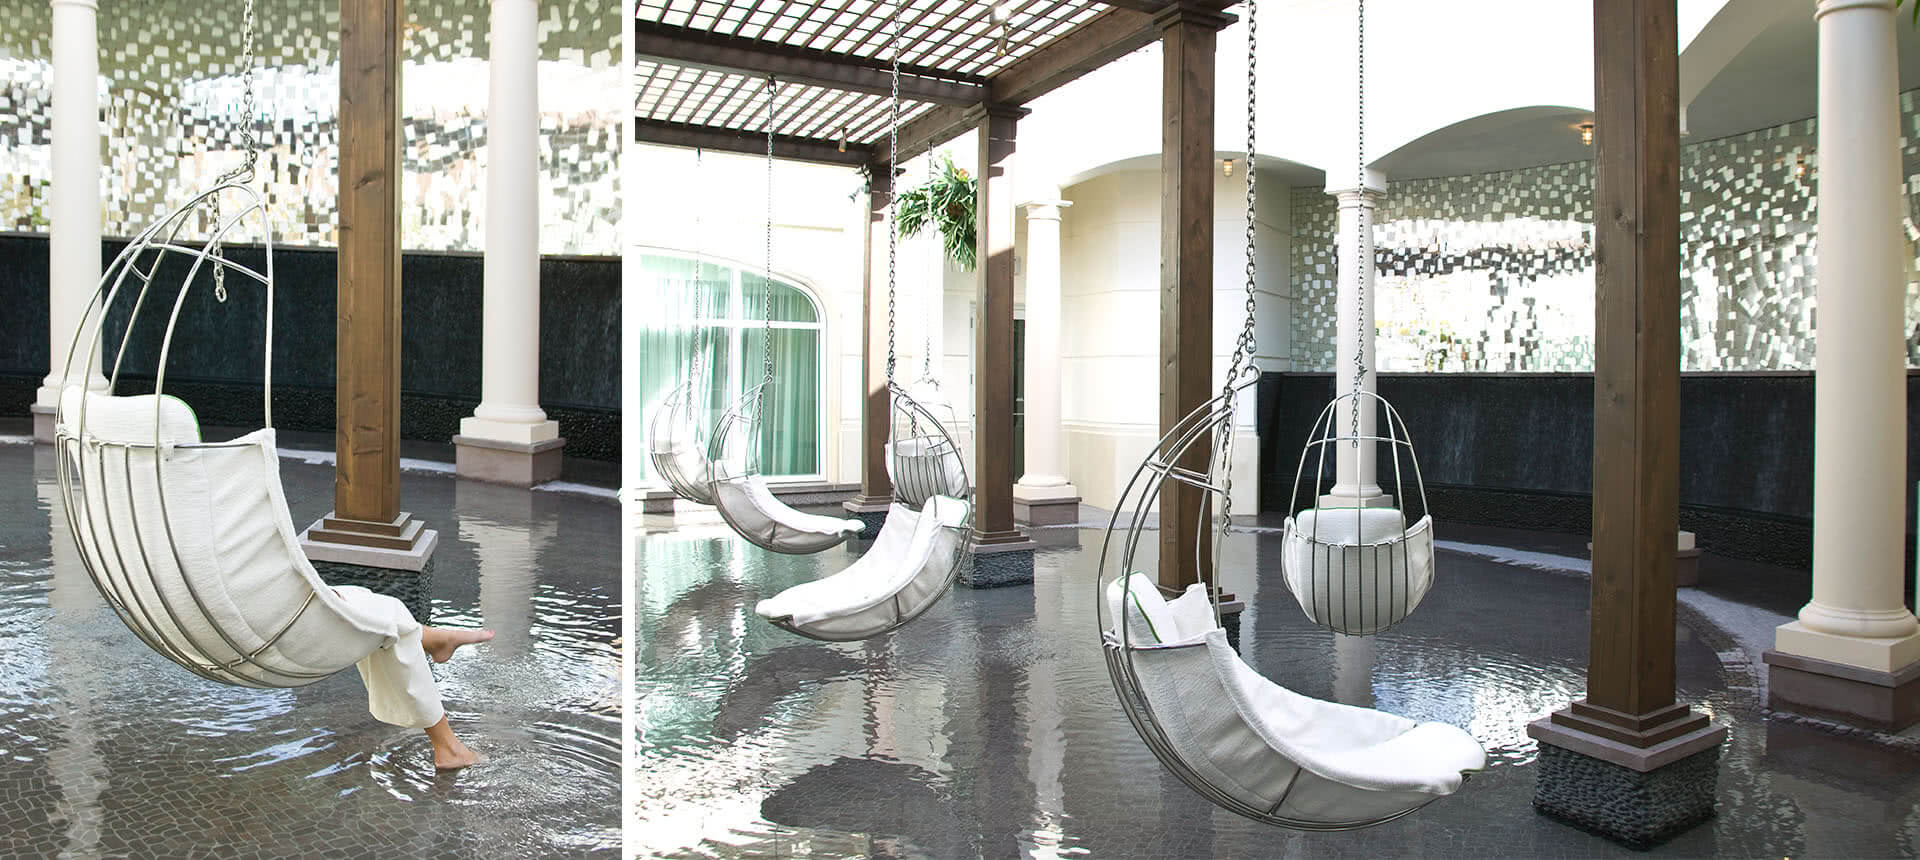 Hospitality Interior Architecture and Design CallisonRTKL